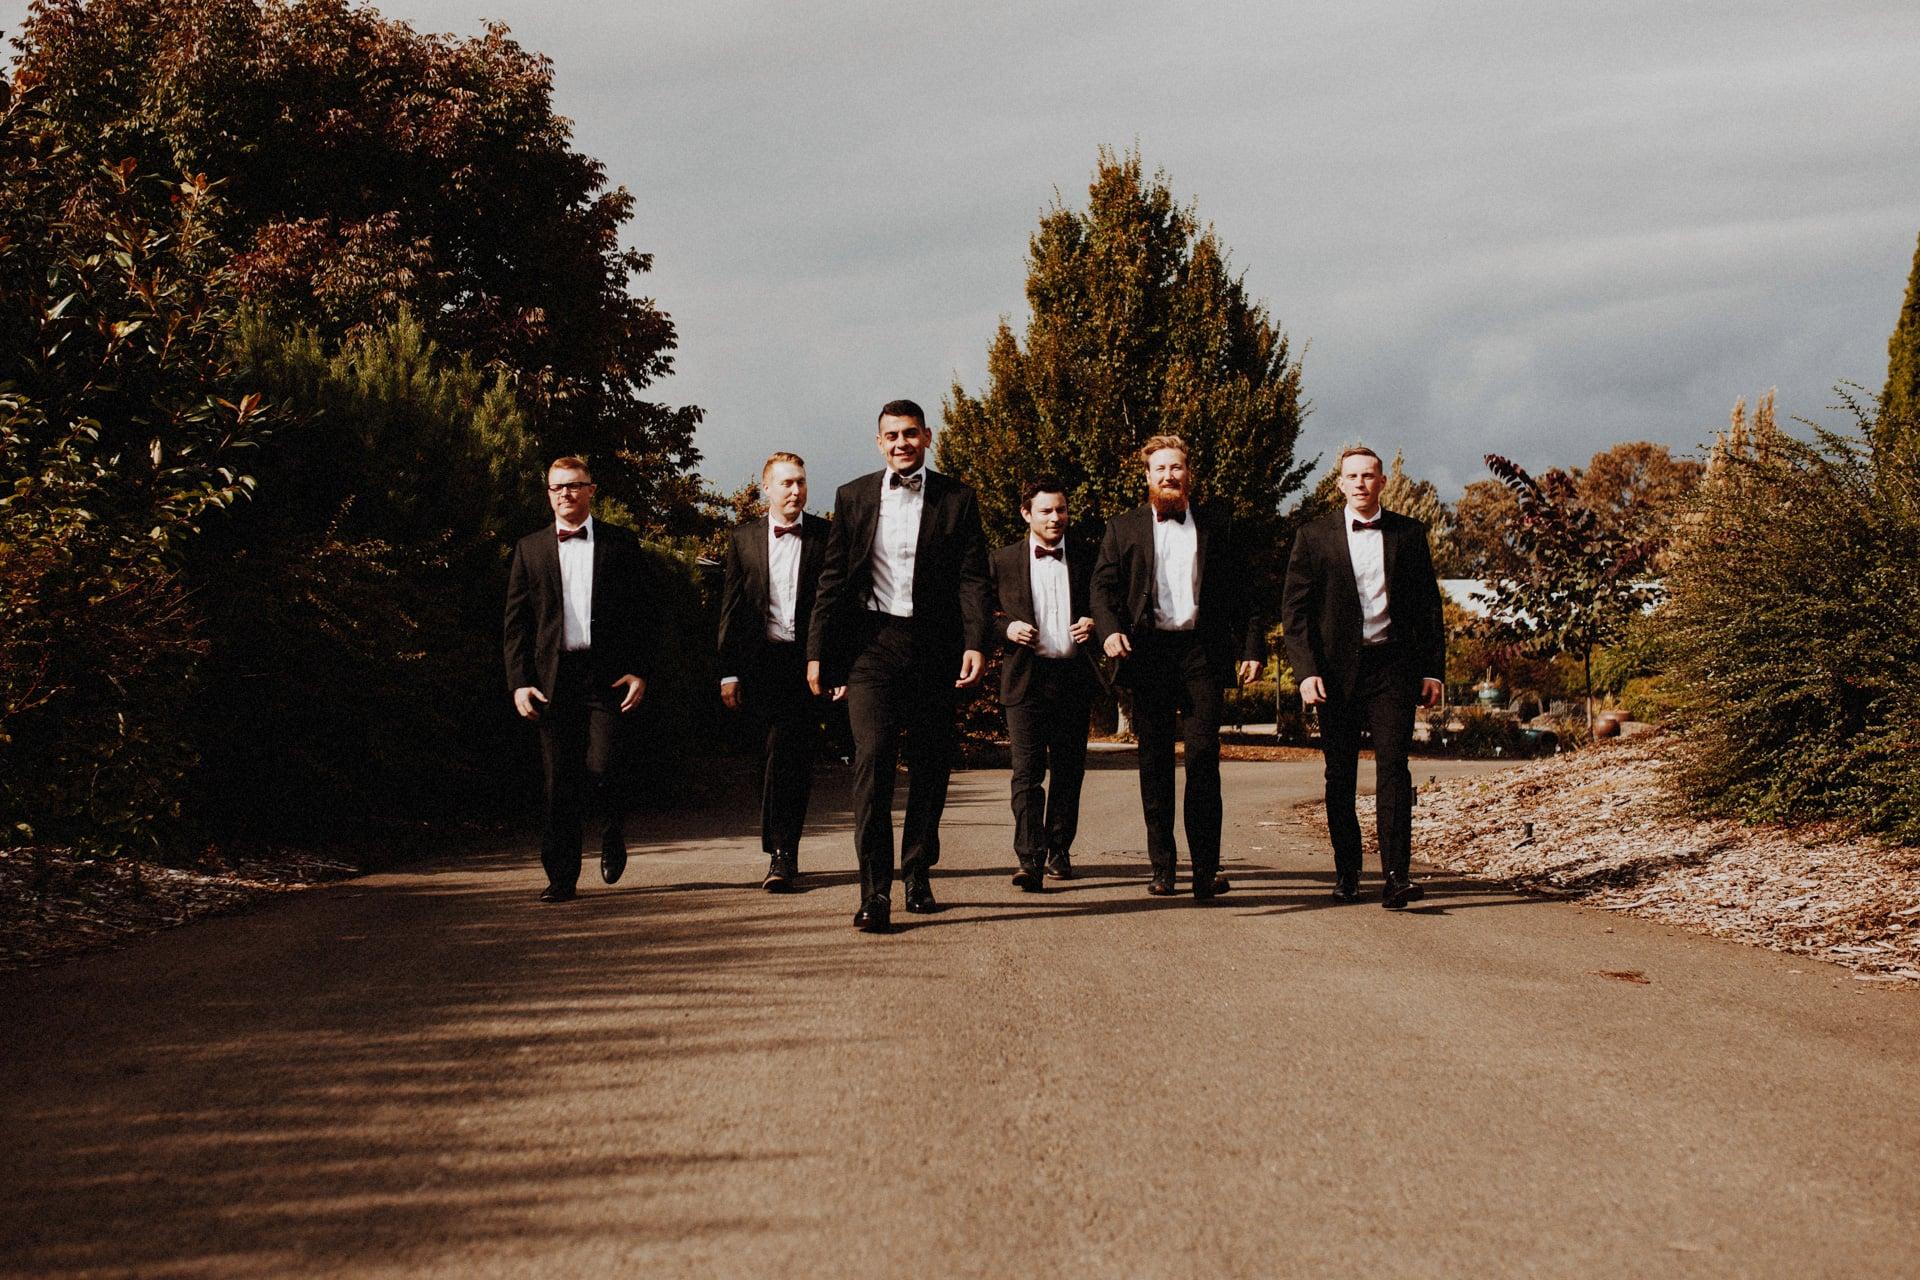 a group of groomsmen walking at the Oregon Garden resort wedding